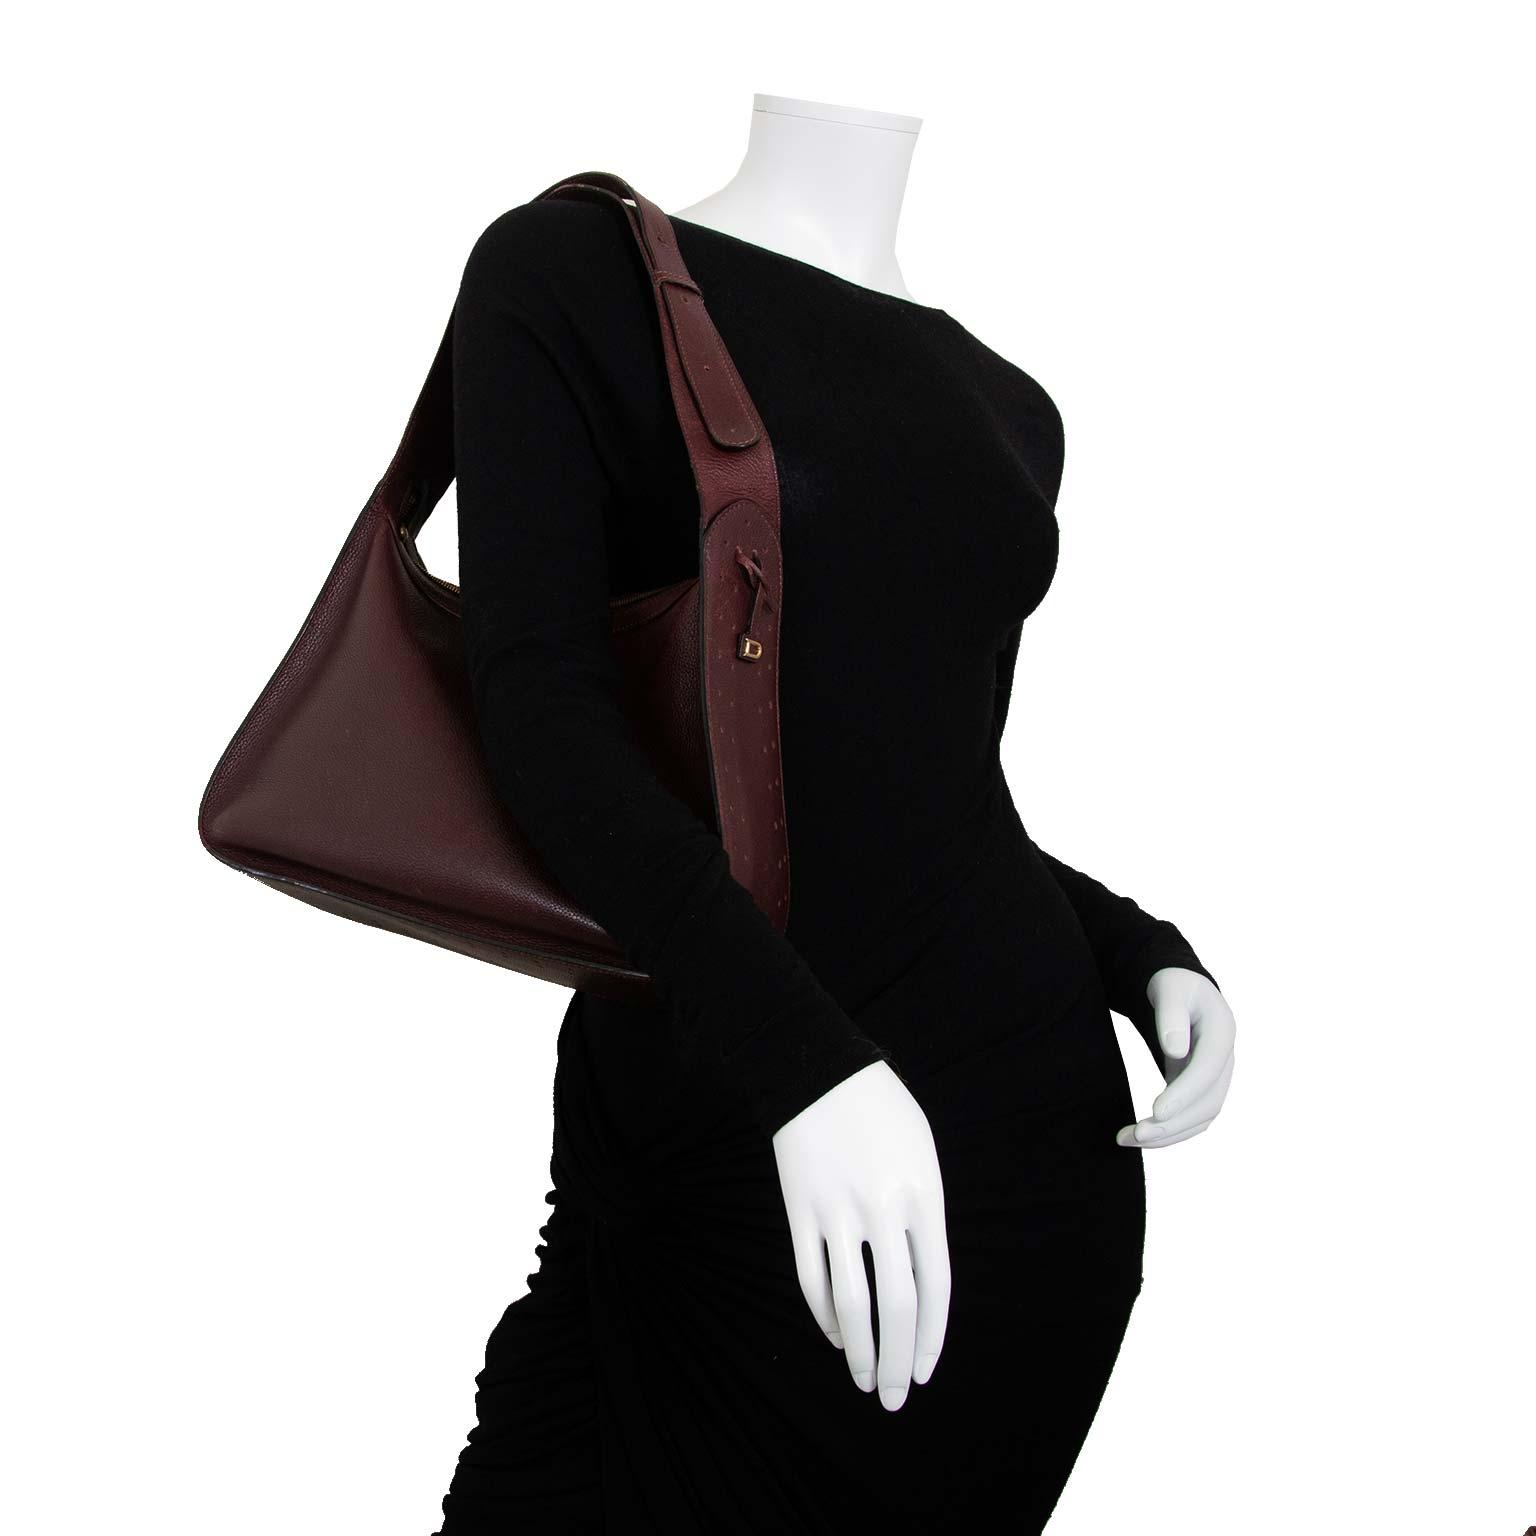 Delvaux Burgundy Pensée Shoulder Bag now for sale at labellov vintage fashion webshop belgium